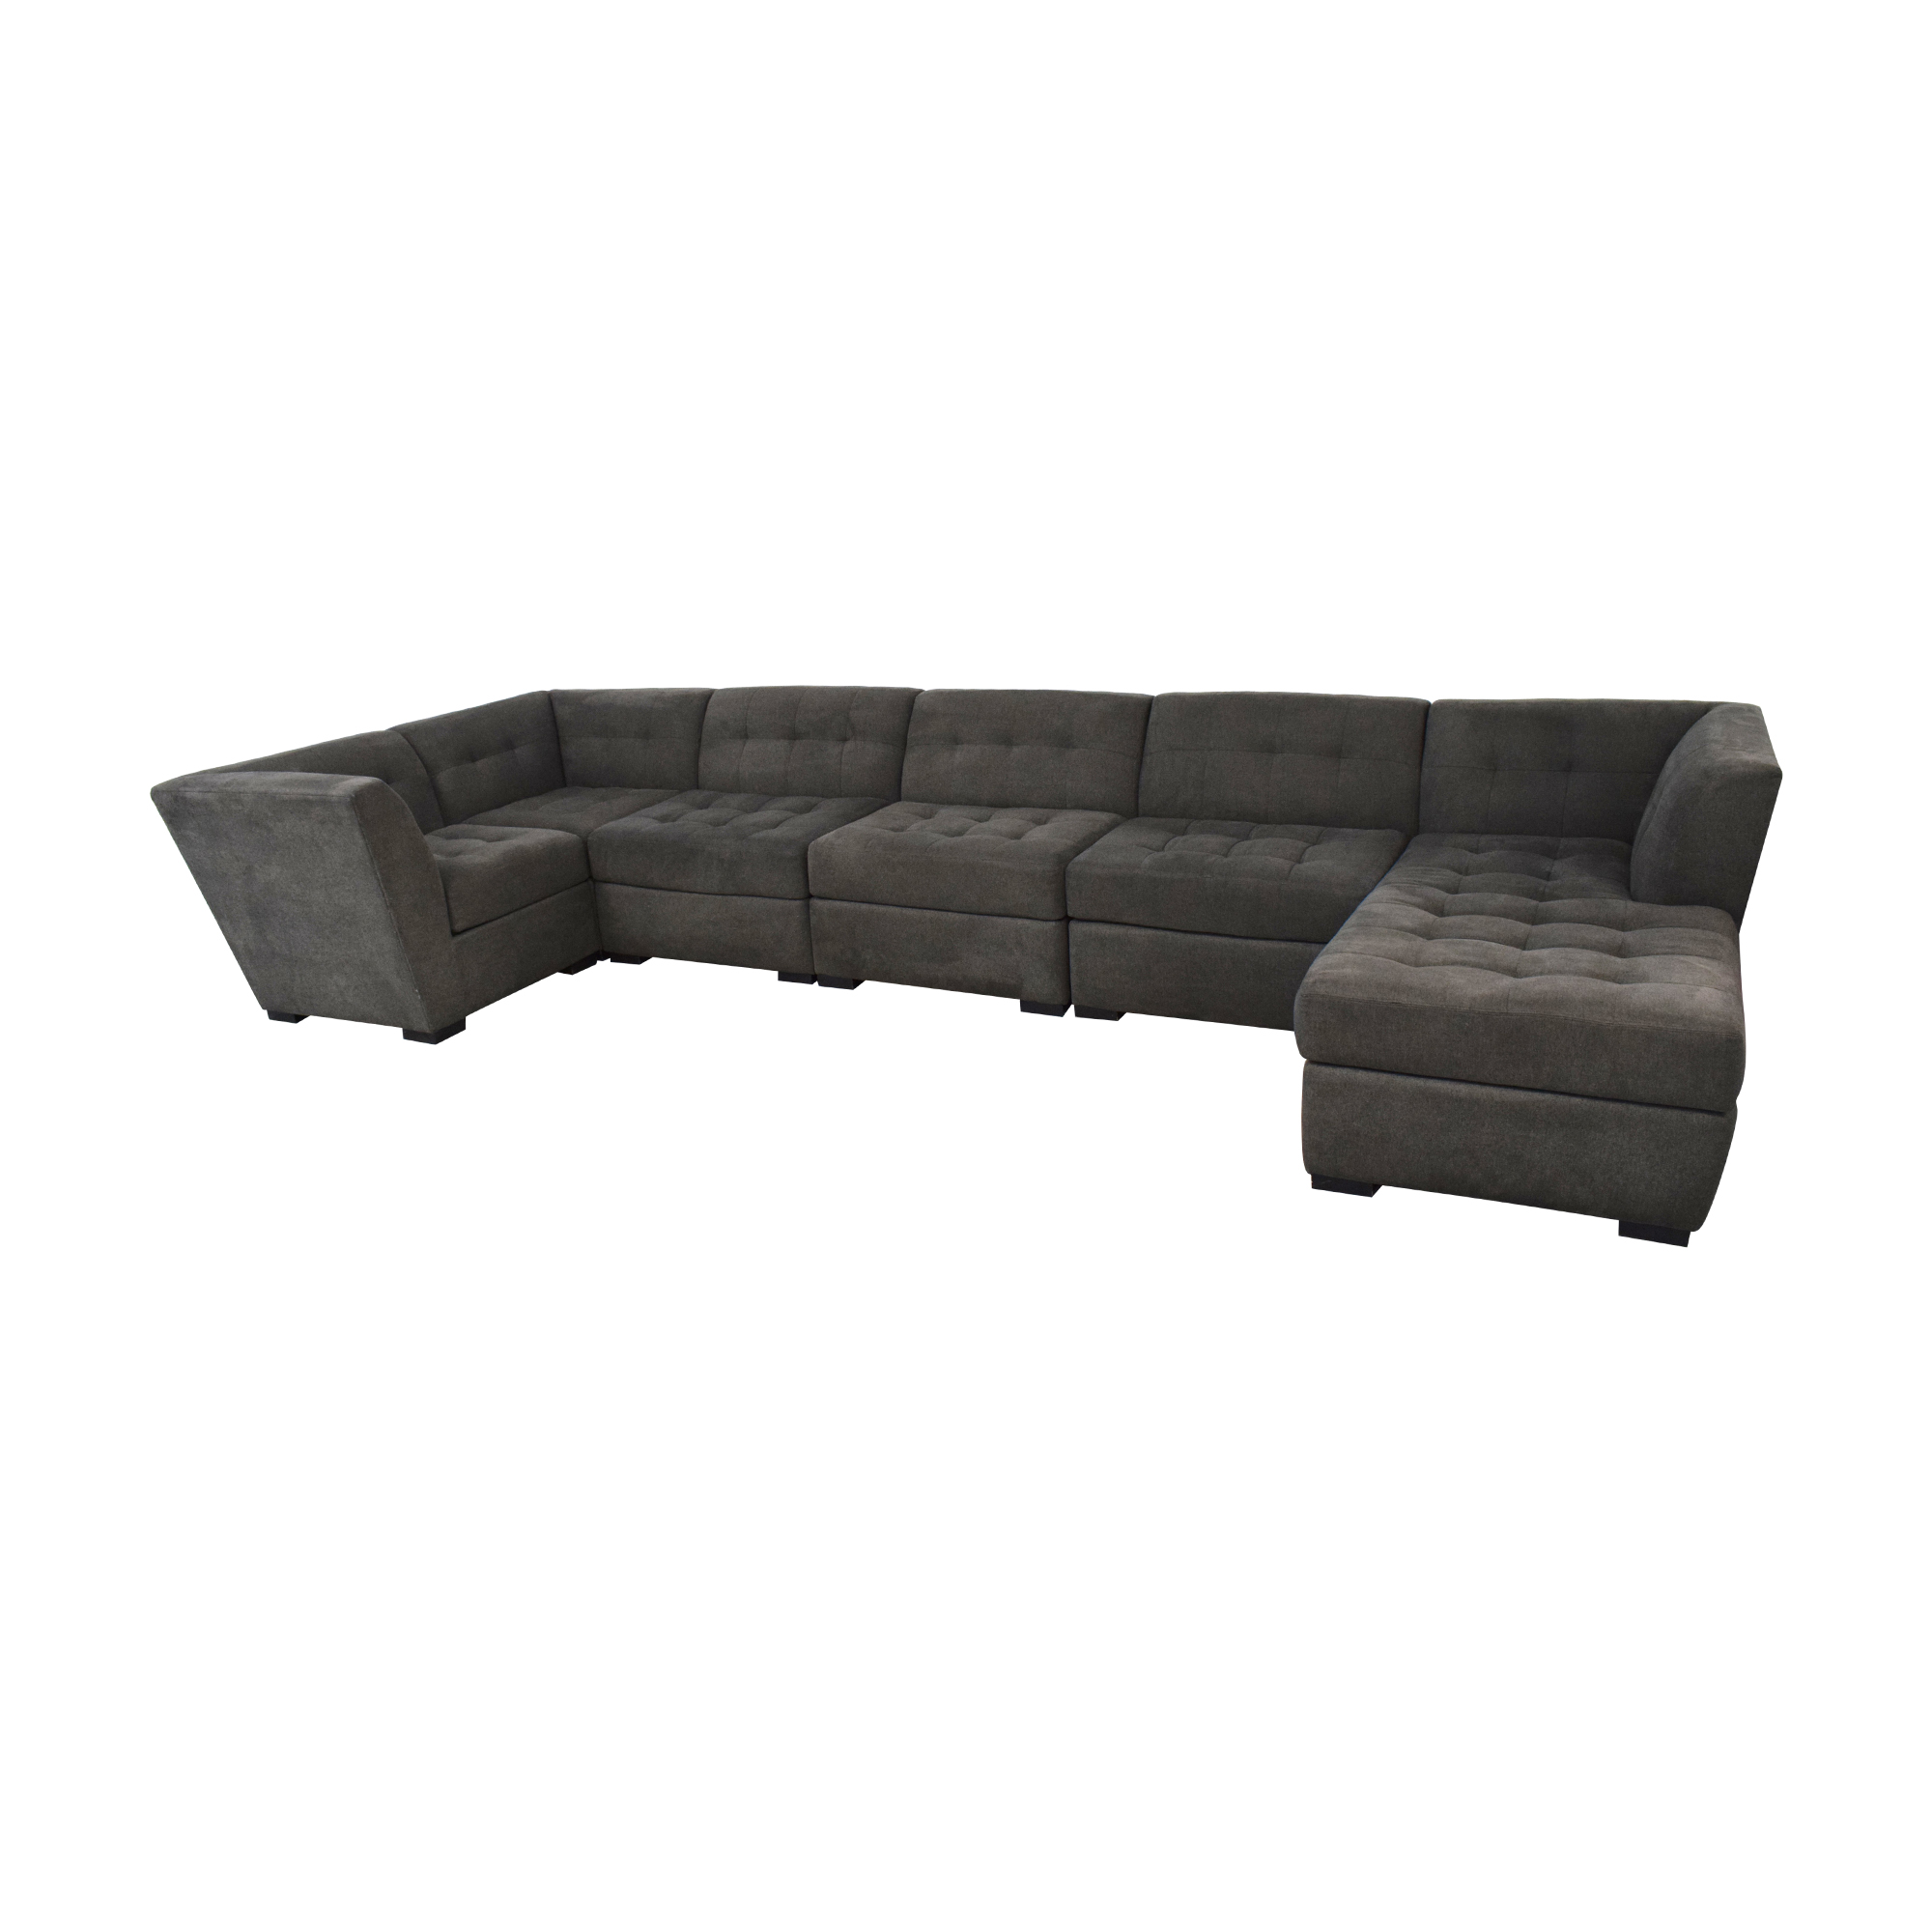 Macy's Roxanne II Modular Sofa with Bumper Chaise / Sofas